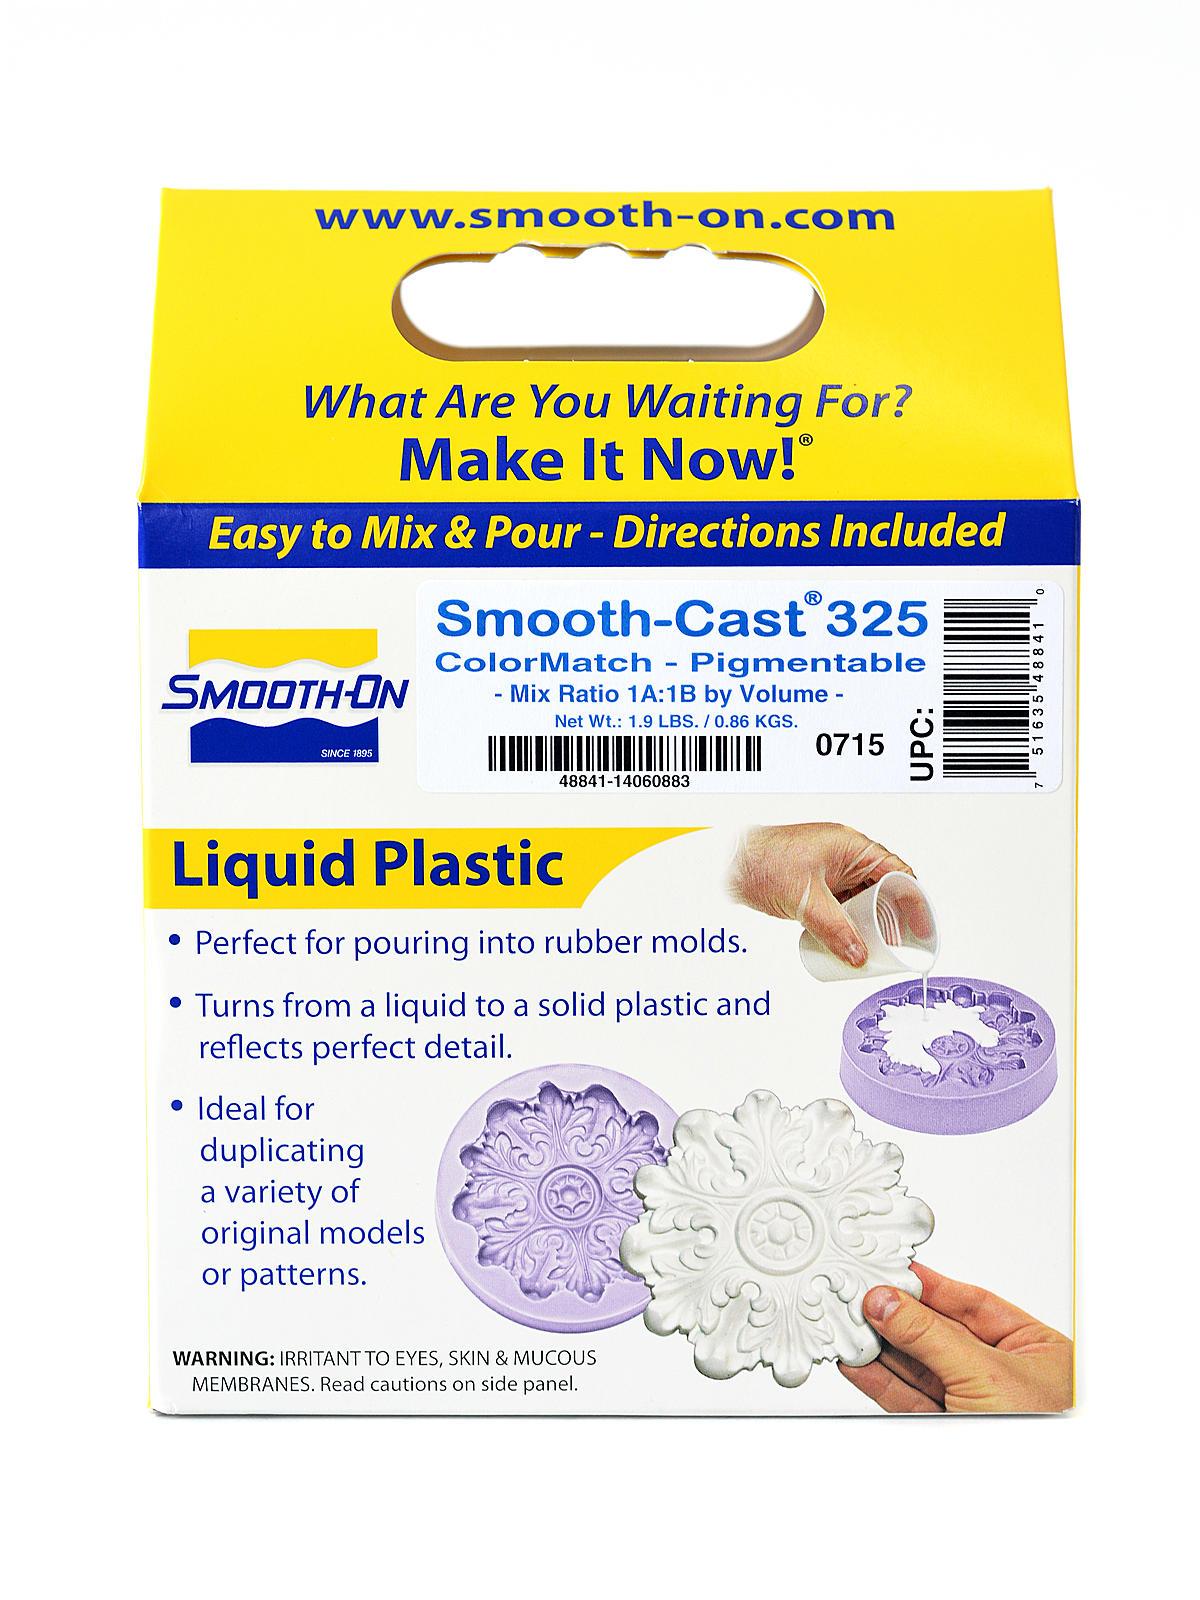 Smooth-Cast 325 ColorMatch Liquid Plastic Compound